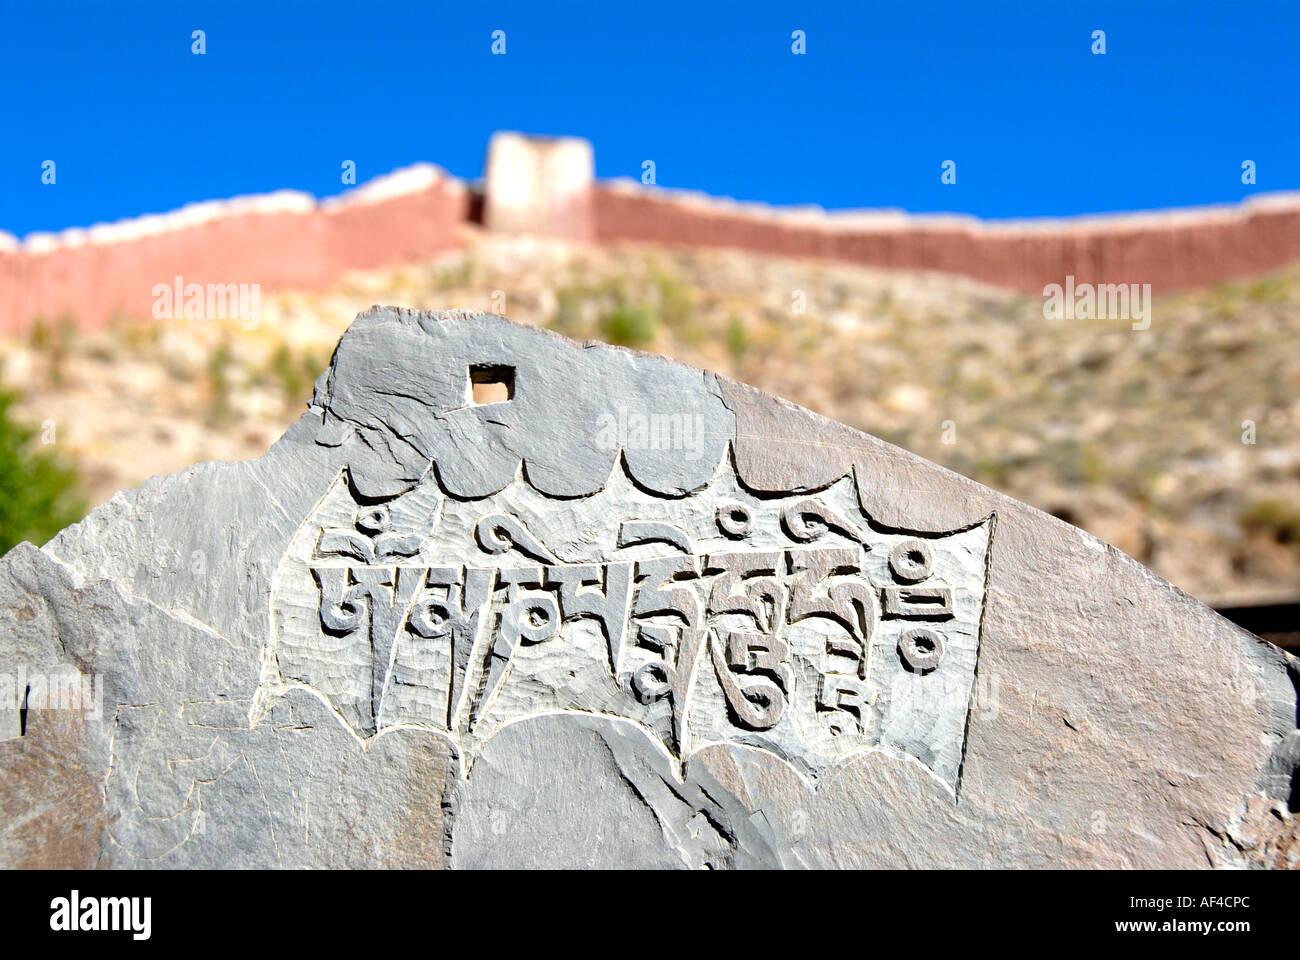 Tibetan script on a rock Om Mani Padme Hum in Pelkor Chöde Monastery Gyantse Tibet China - Stock Image